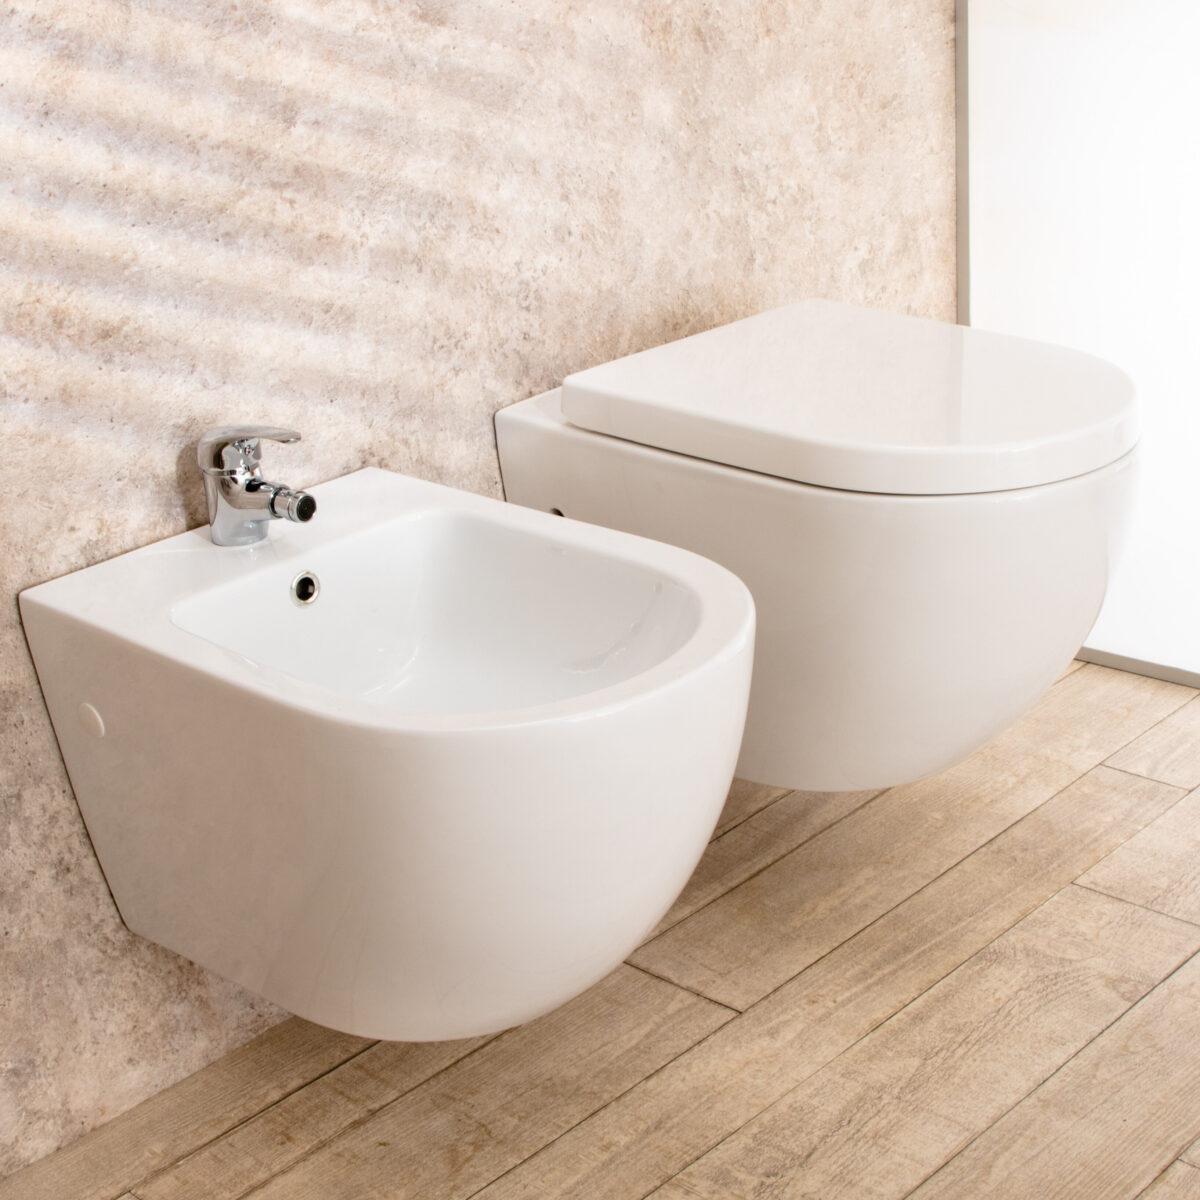 10-idee-per-arredare-un-bagno-cieco-15